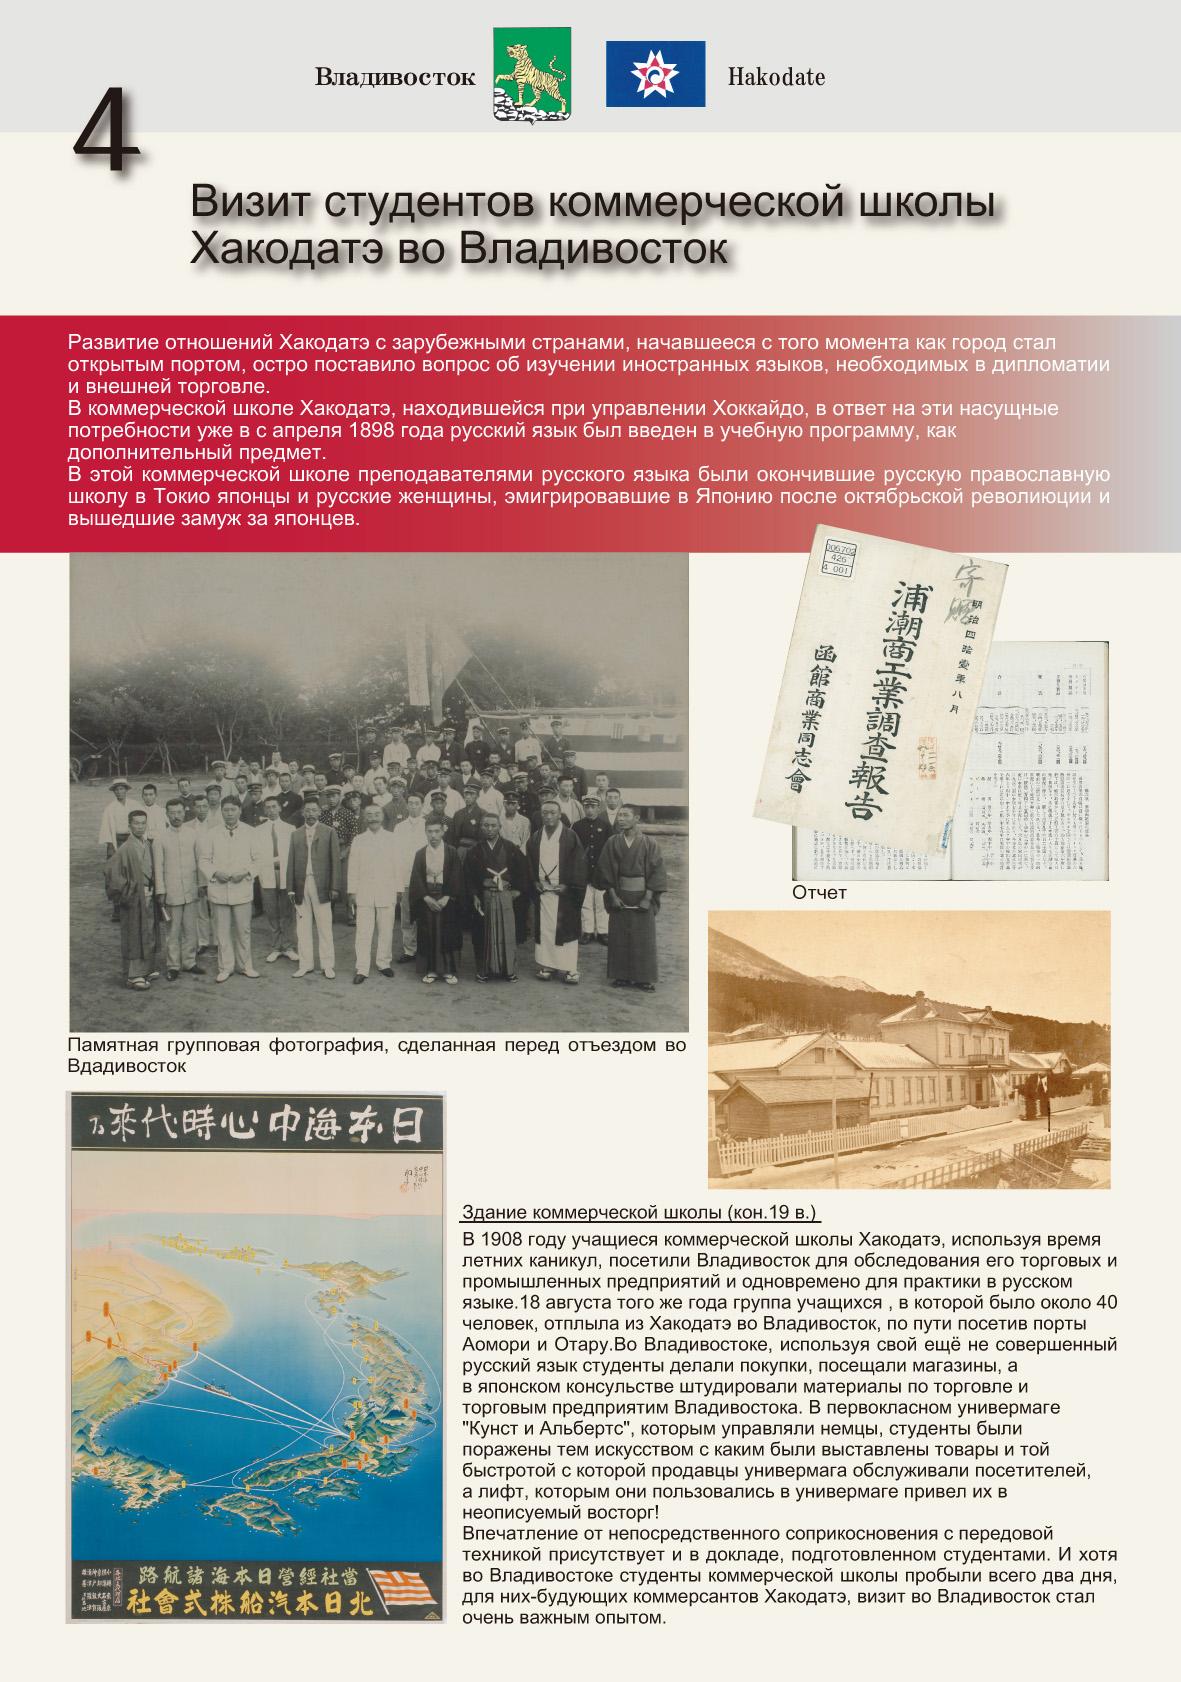 http://hakodate-russia.com/main/image/2011-panel04.jpg